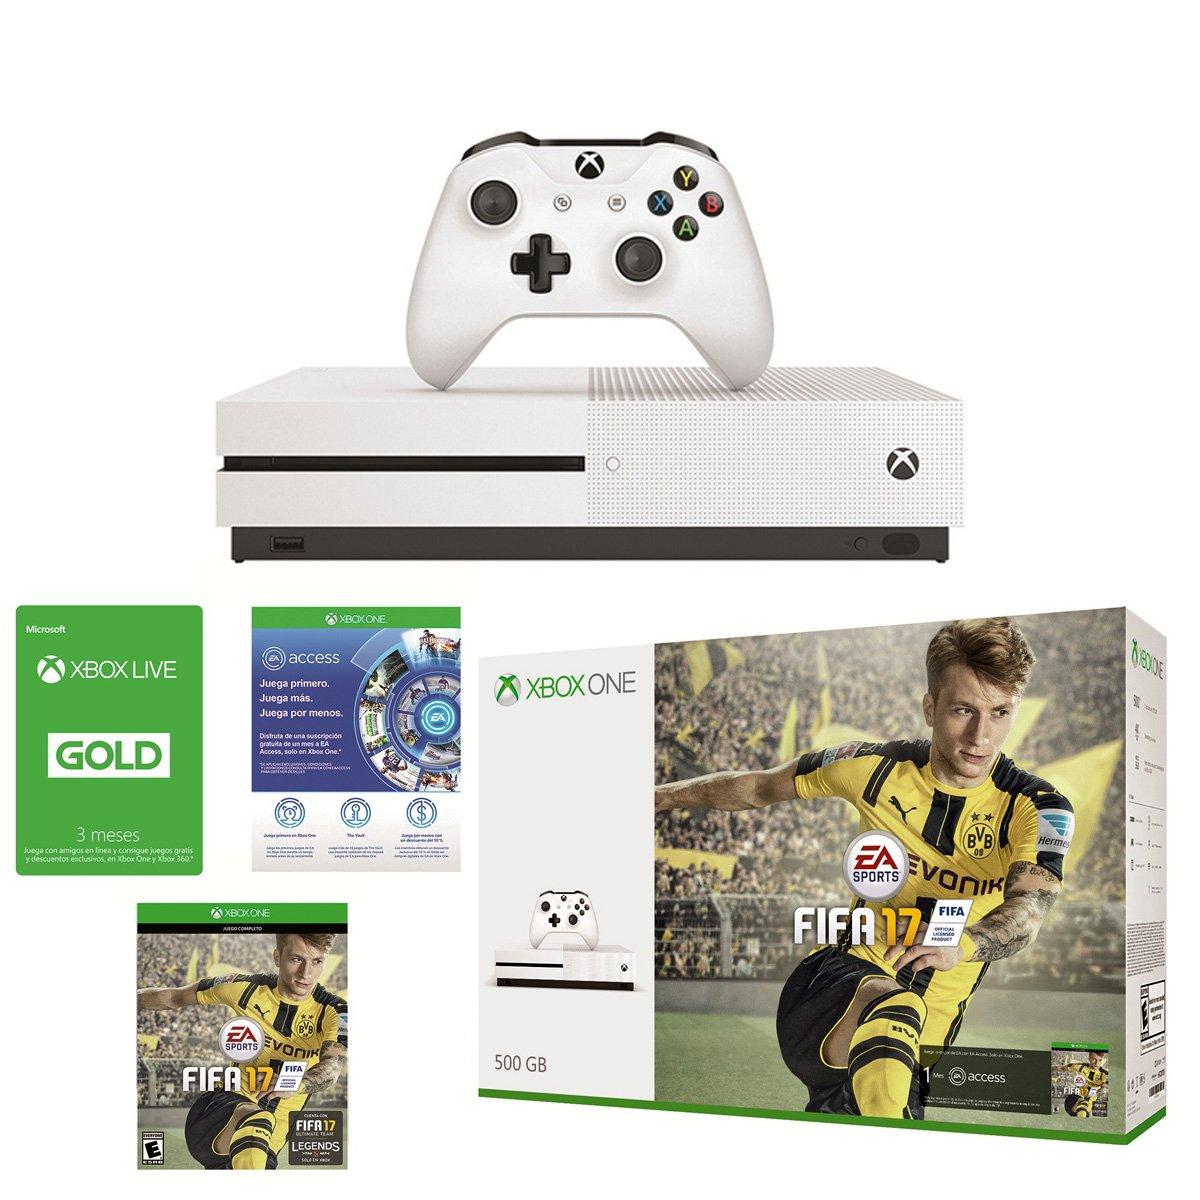 Consola Xbox One S 500Gb Fifa17 + Tarjeta Live Gold 3 Meses